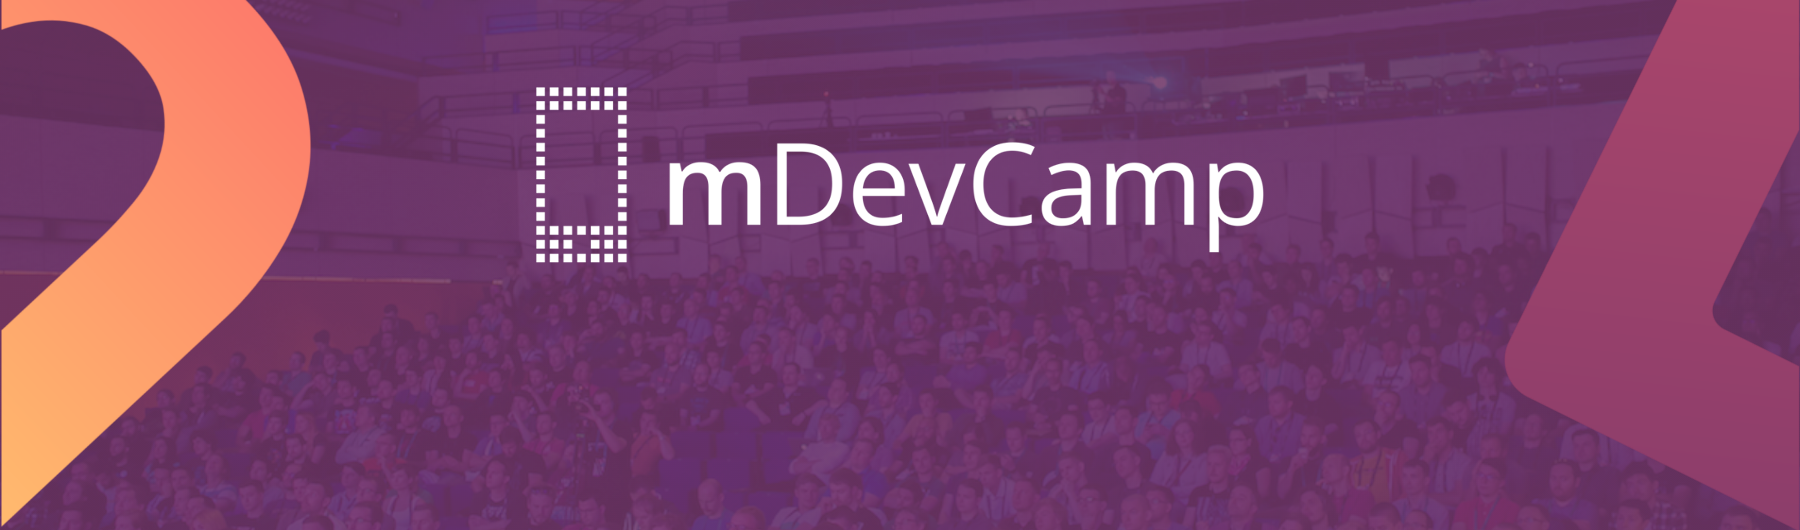 mDevCamp 2020